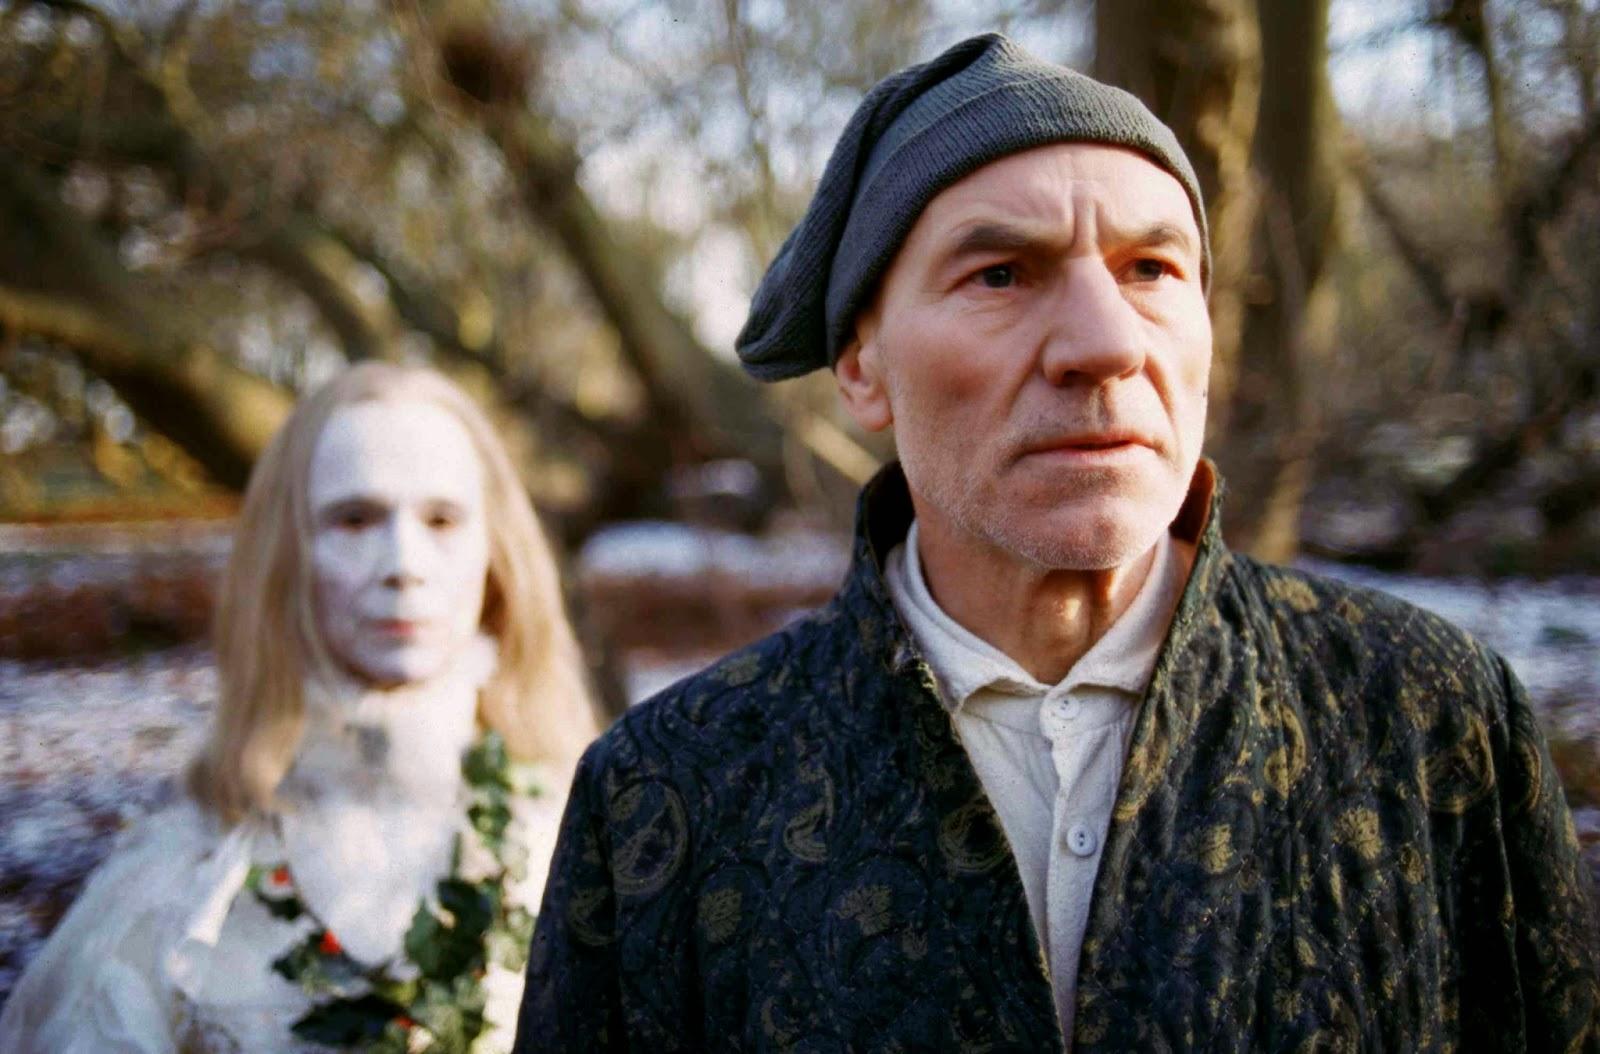 Christmas TV History: Christmas TV Movie Recommendations